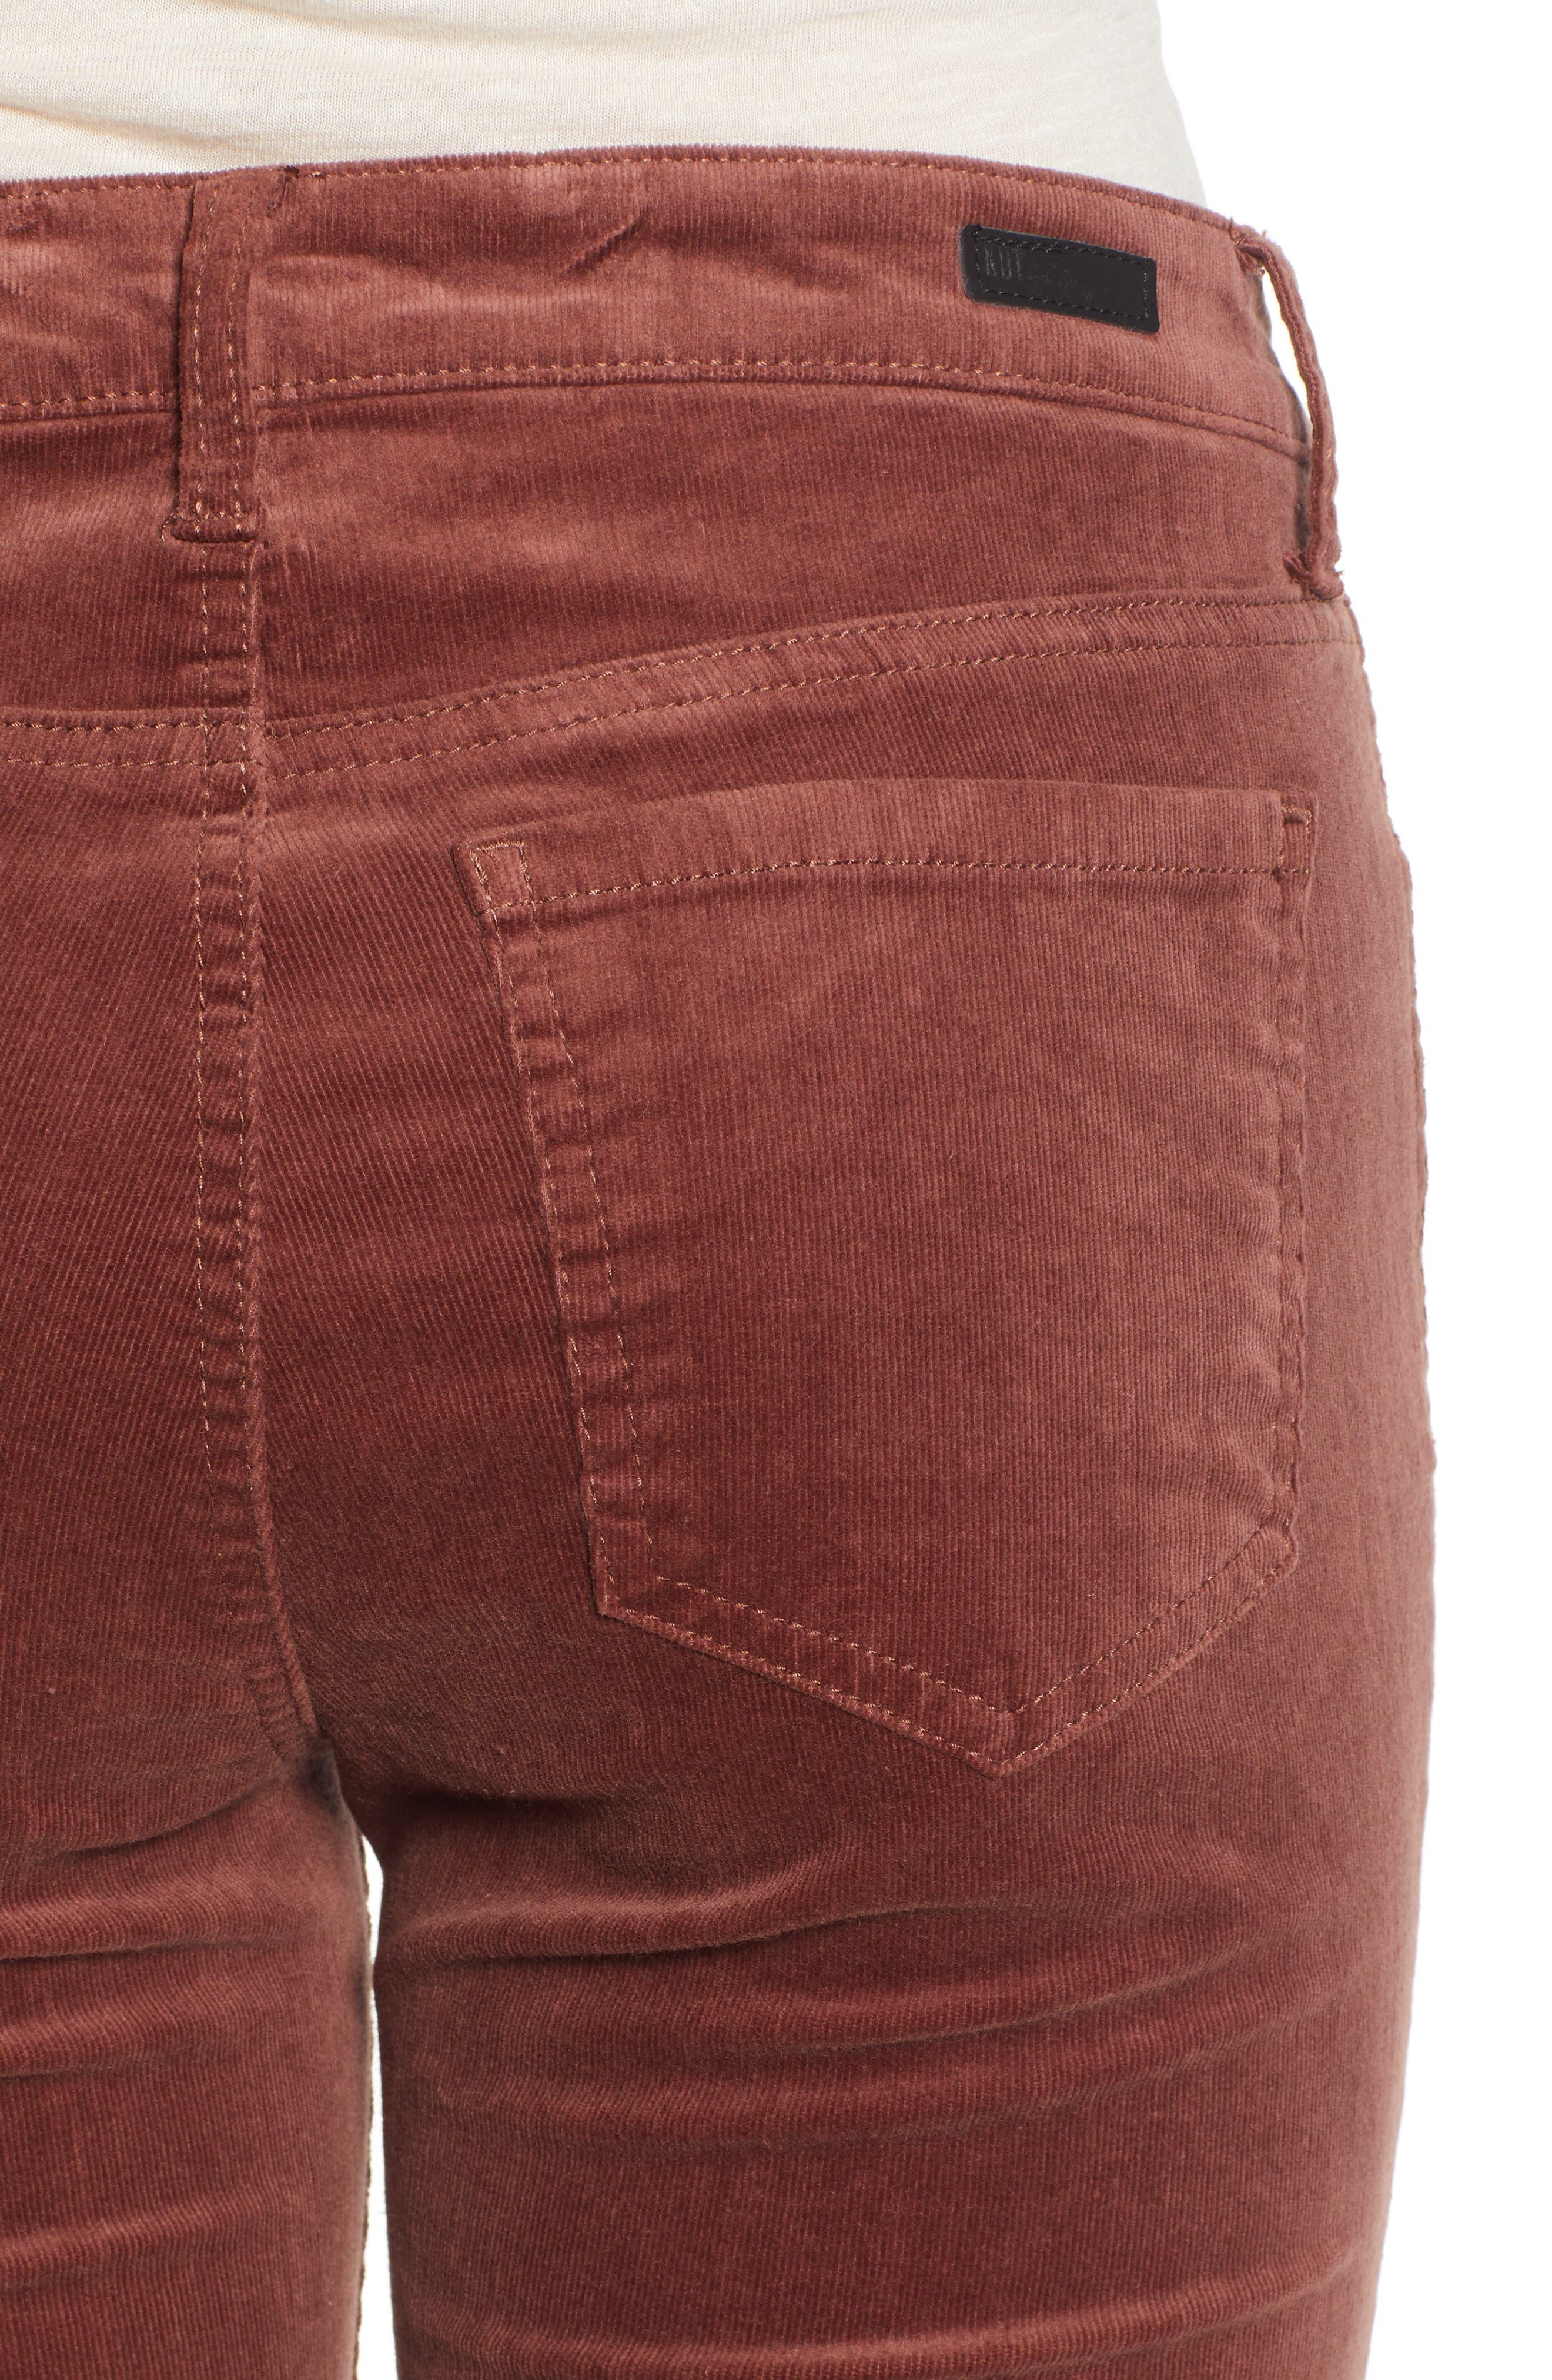 'Diana' Stretch Corduroy Skinny Pants,                             Alternate thumbnail 169, color,